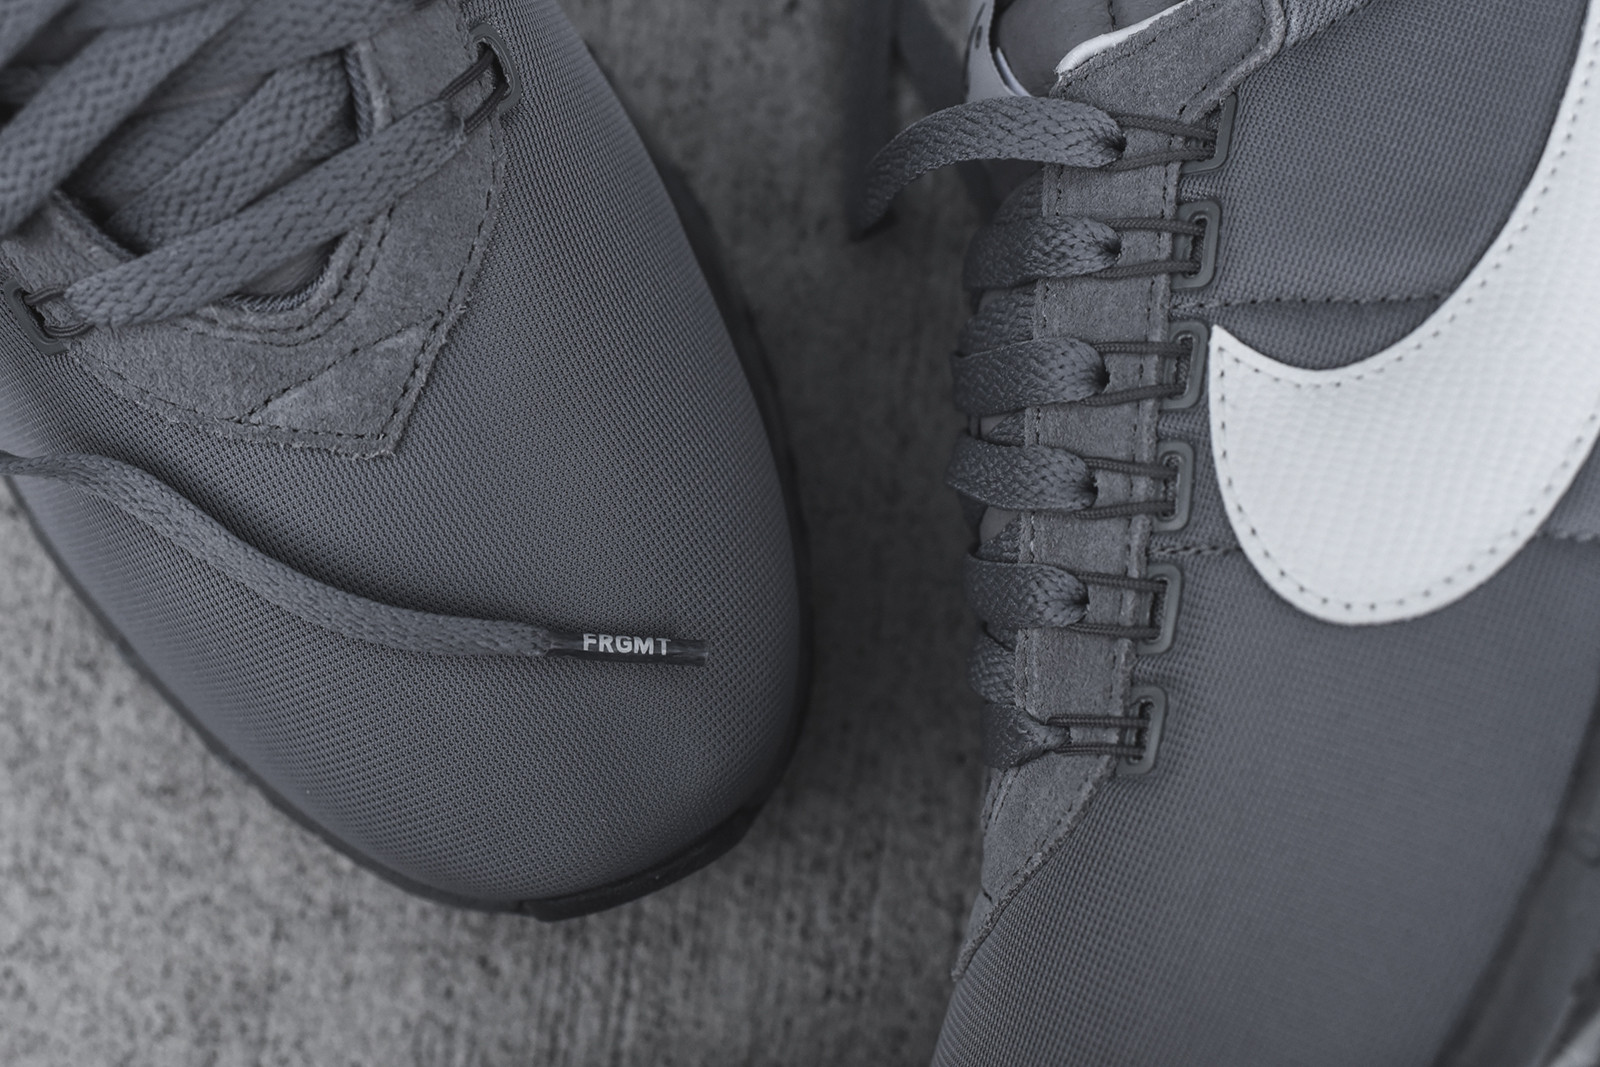 Fragment Nike Air Max LD Zero Grey 885893 002 Enhedssamler  Sole Collector